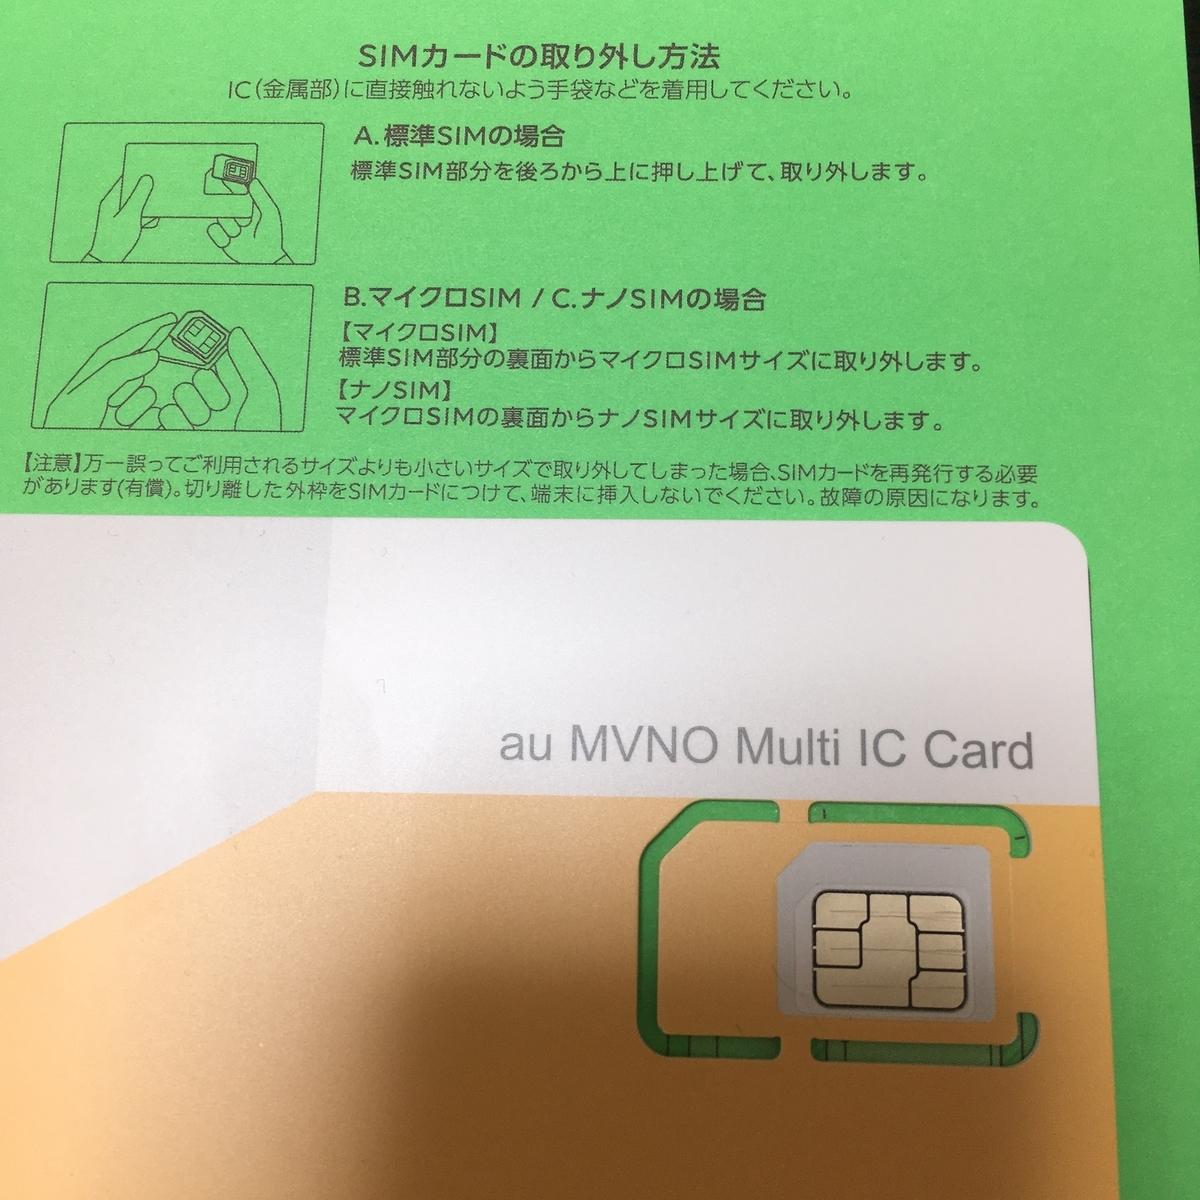 f:id:kiyoshi_net:20190609094038j:plain